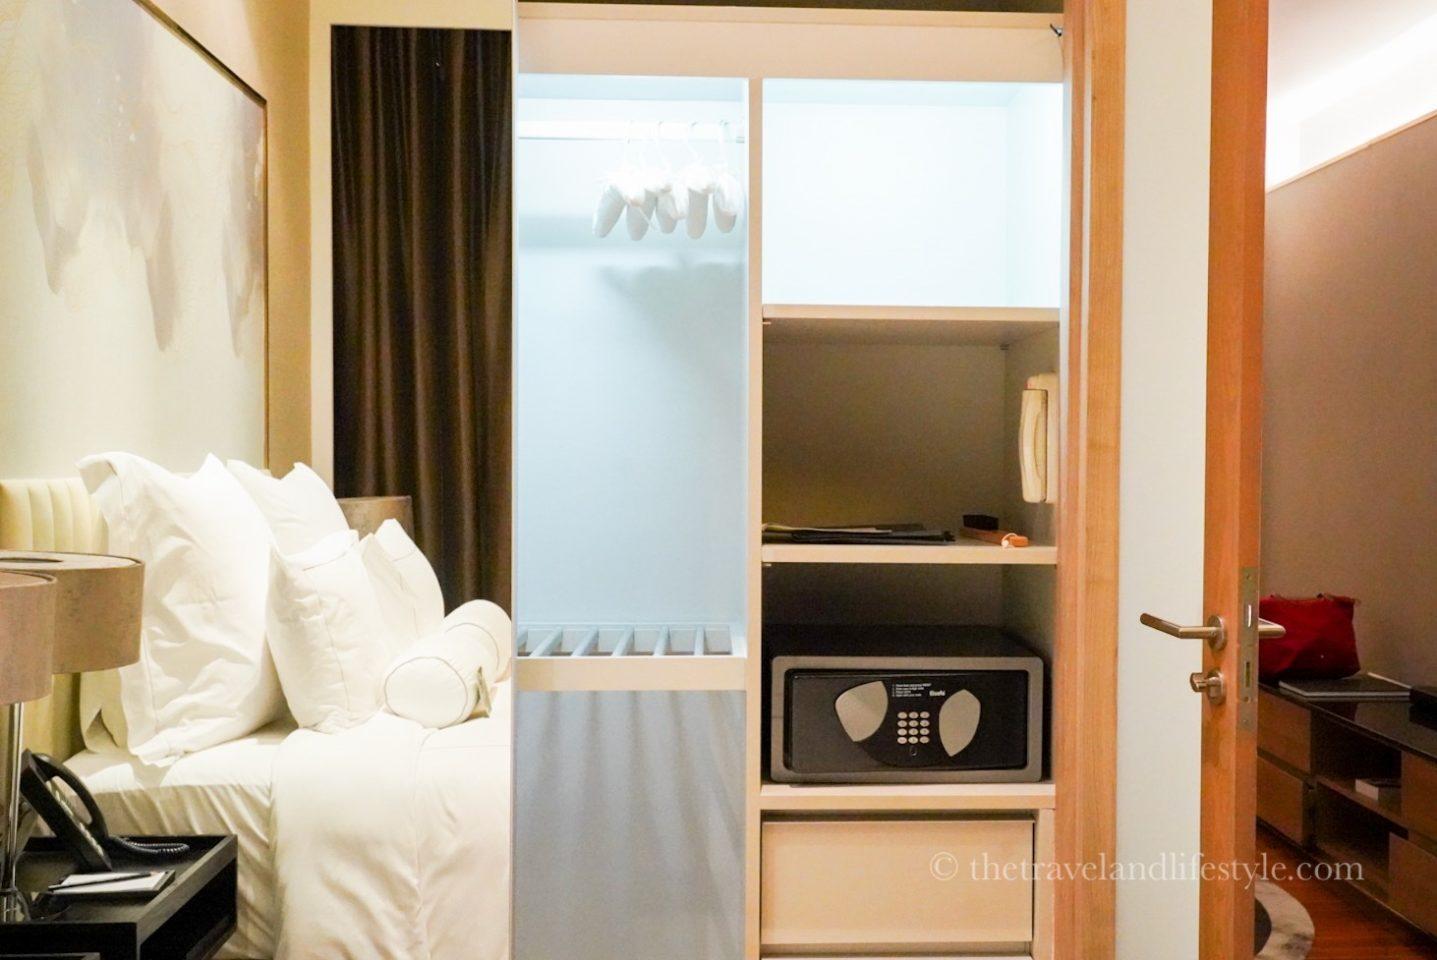 dsc07805 - akyra Thonglor Bangkok -  バンコクのラグジュアリーデザイナーズホテル